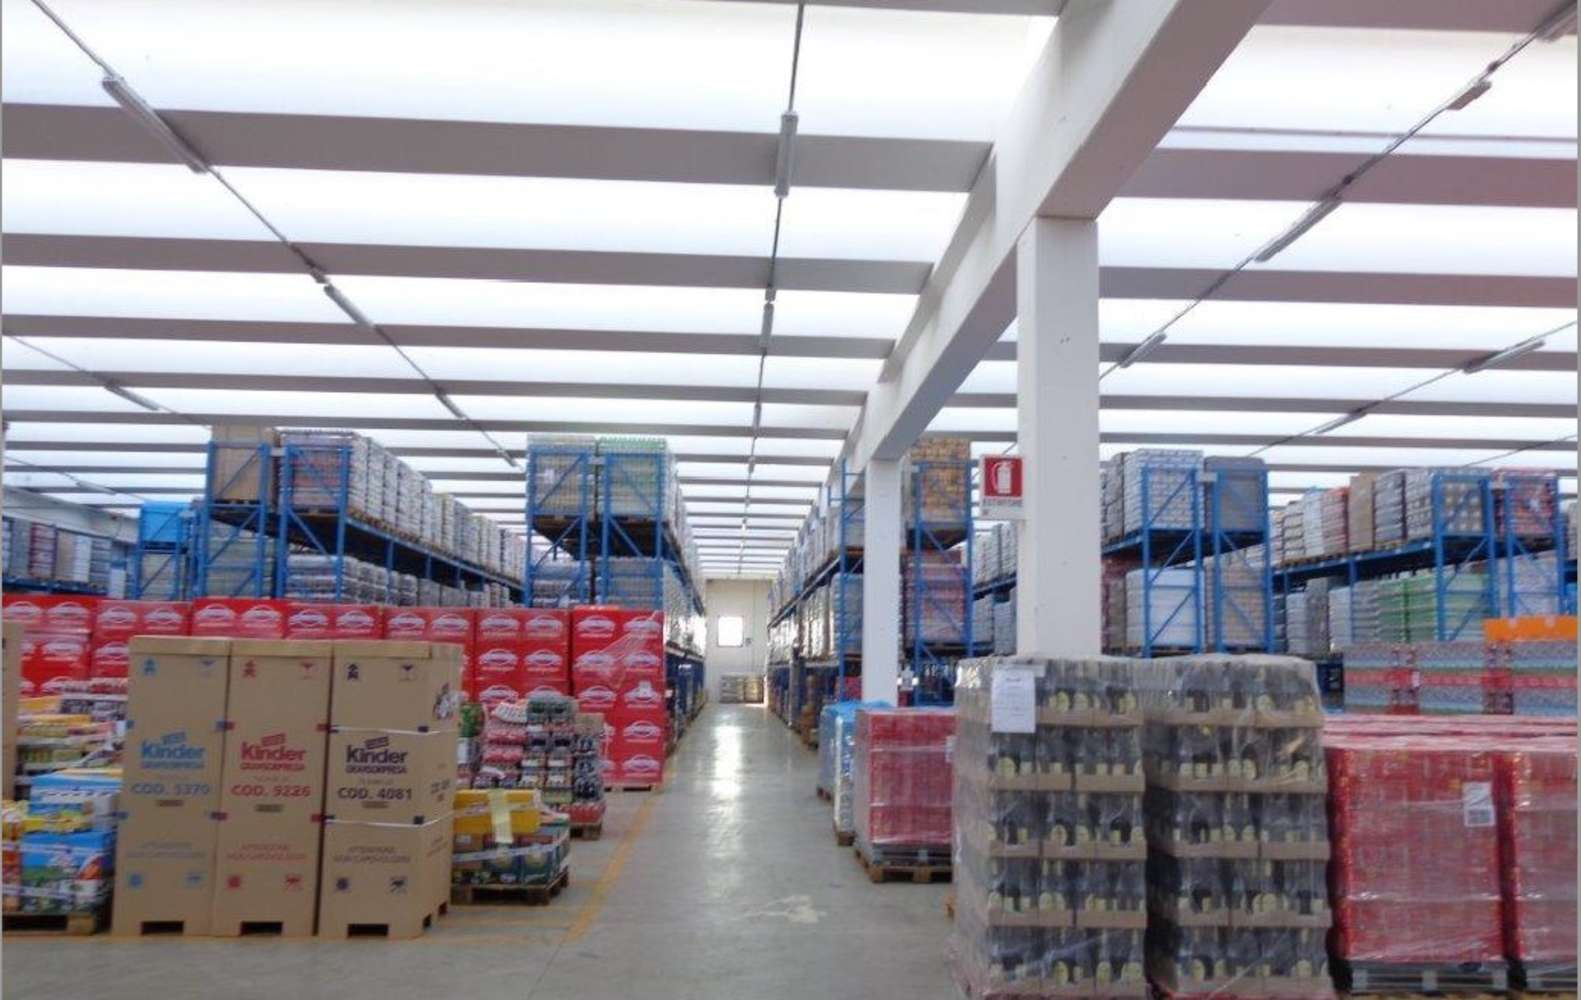 Magazzini industriali e logistici Mozzecane, 37060 - Mozzecane magazzini logistici - 10926879